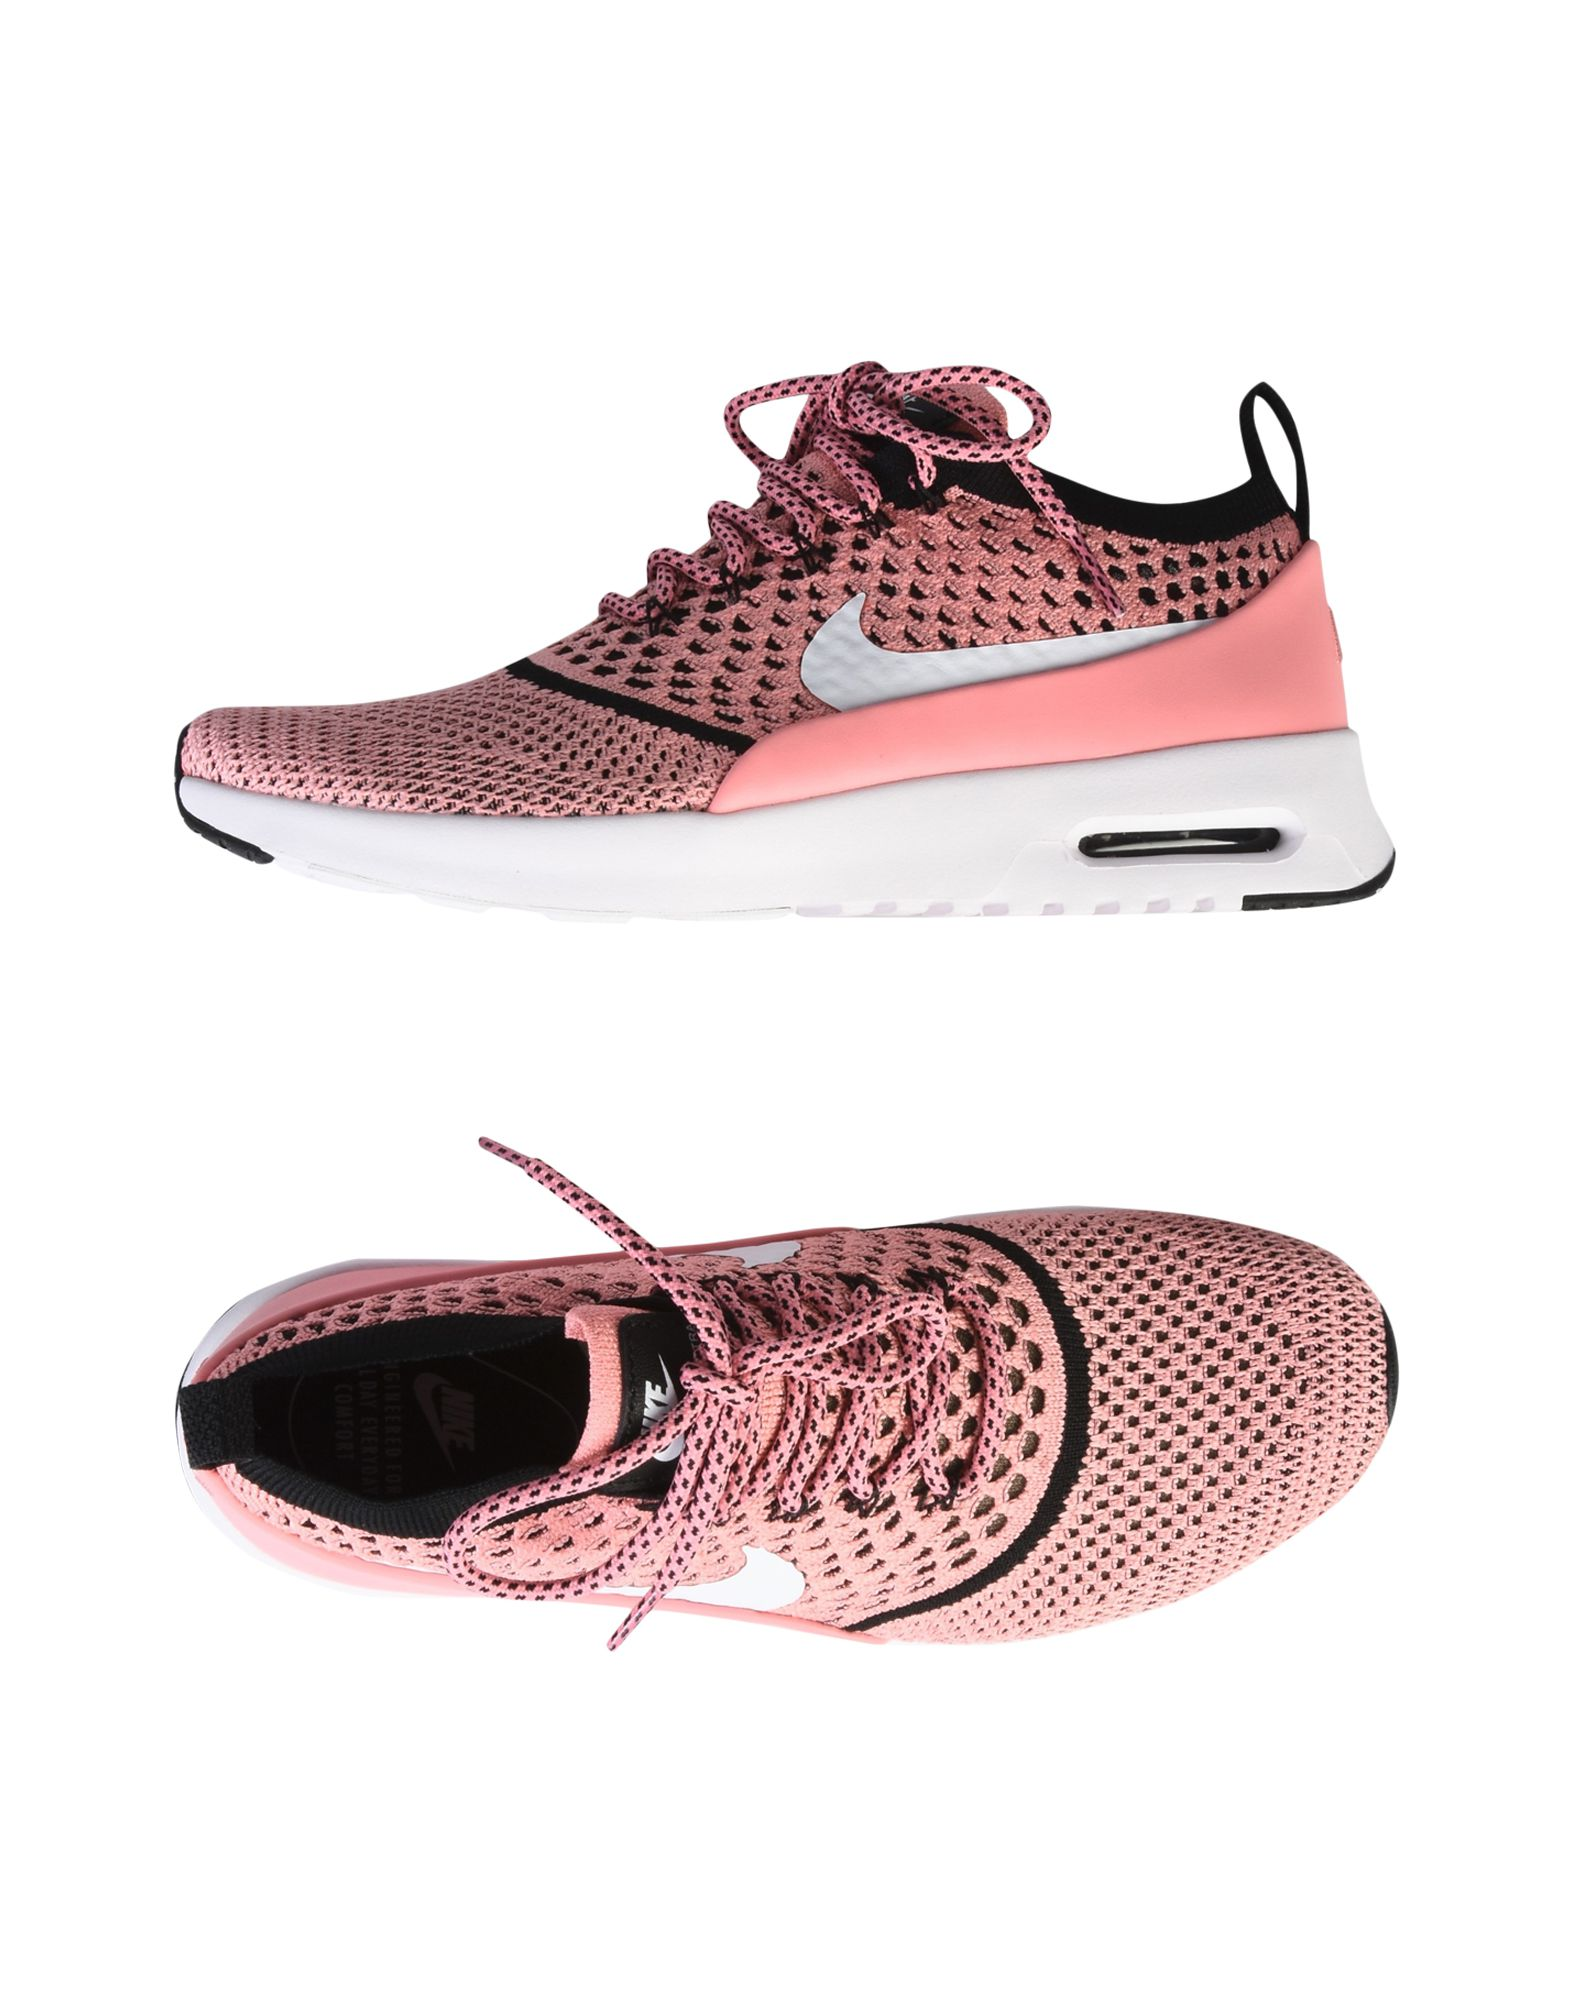 Nike   Air Max Thea Ultra Flyknit  11198332XO Heiße Schuhe